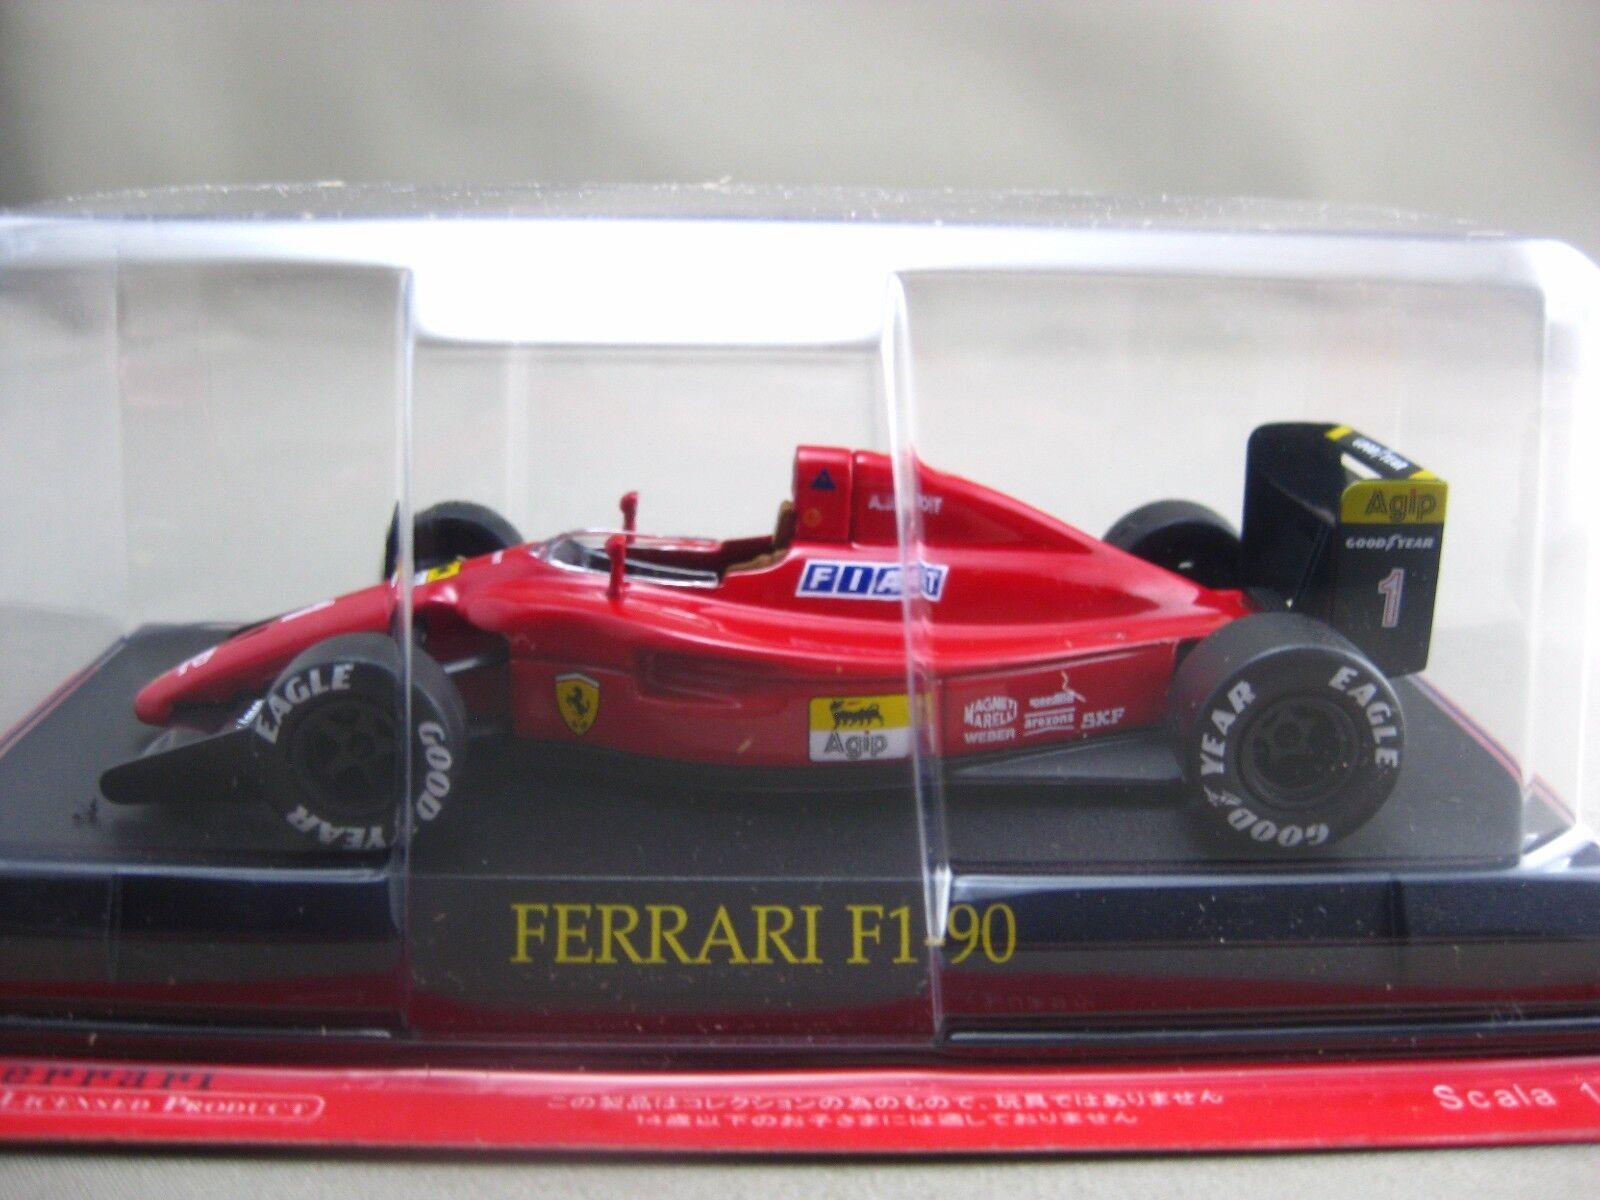 Ferrari F1-90 hachette 1:43 Diecast car Vol.77